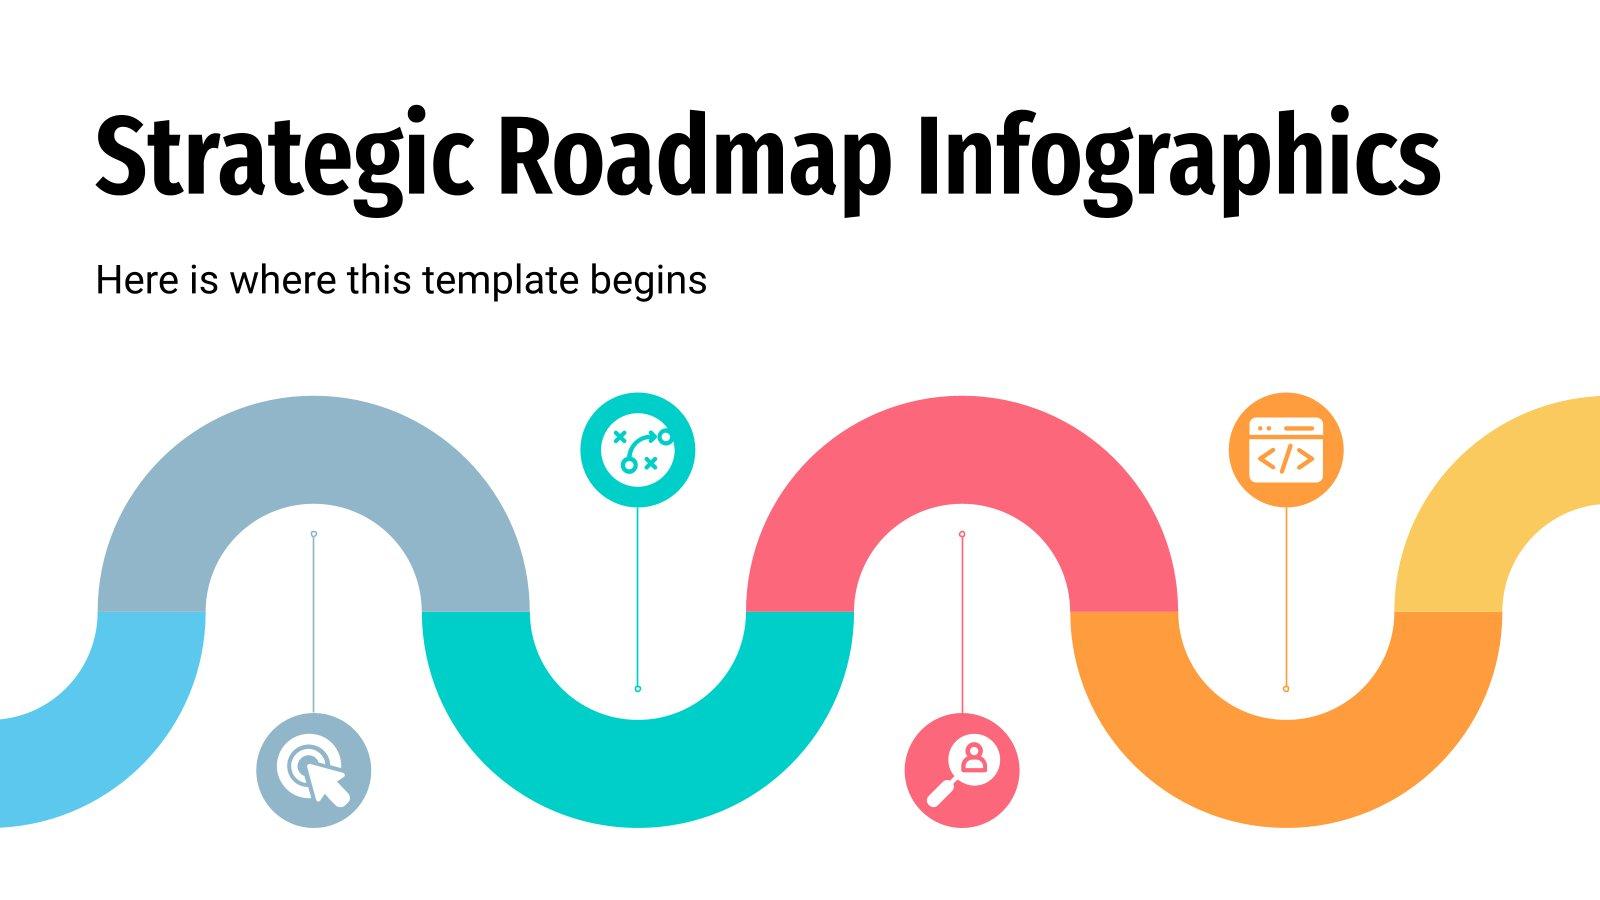 Strategic Roadmap Infographics presentation template